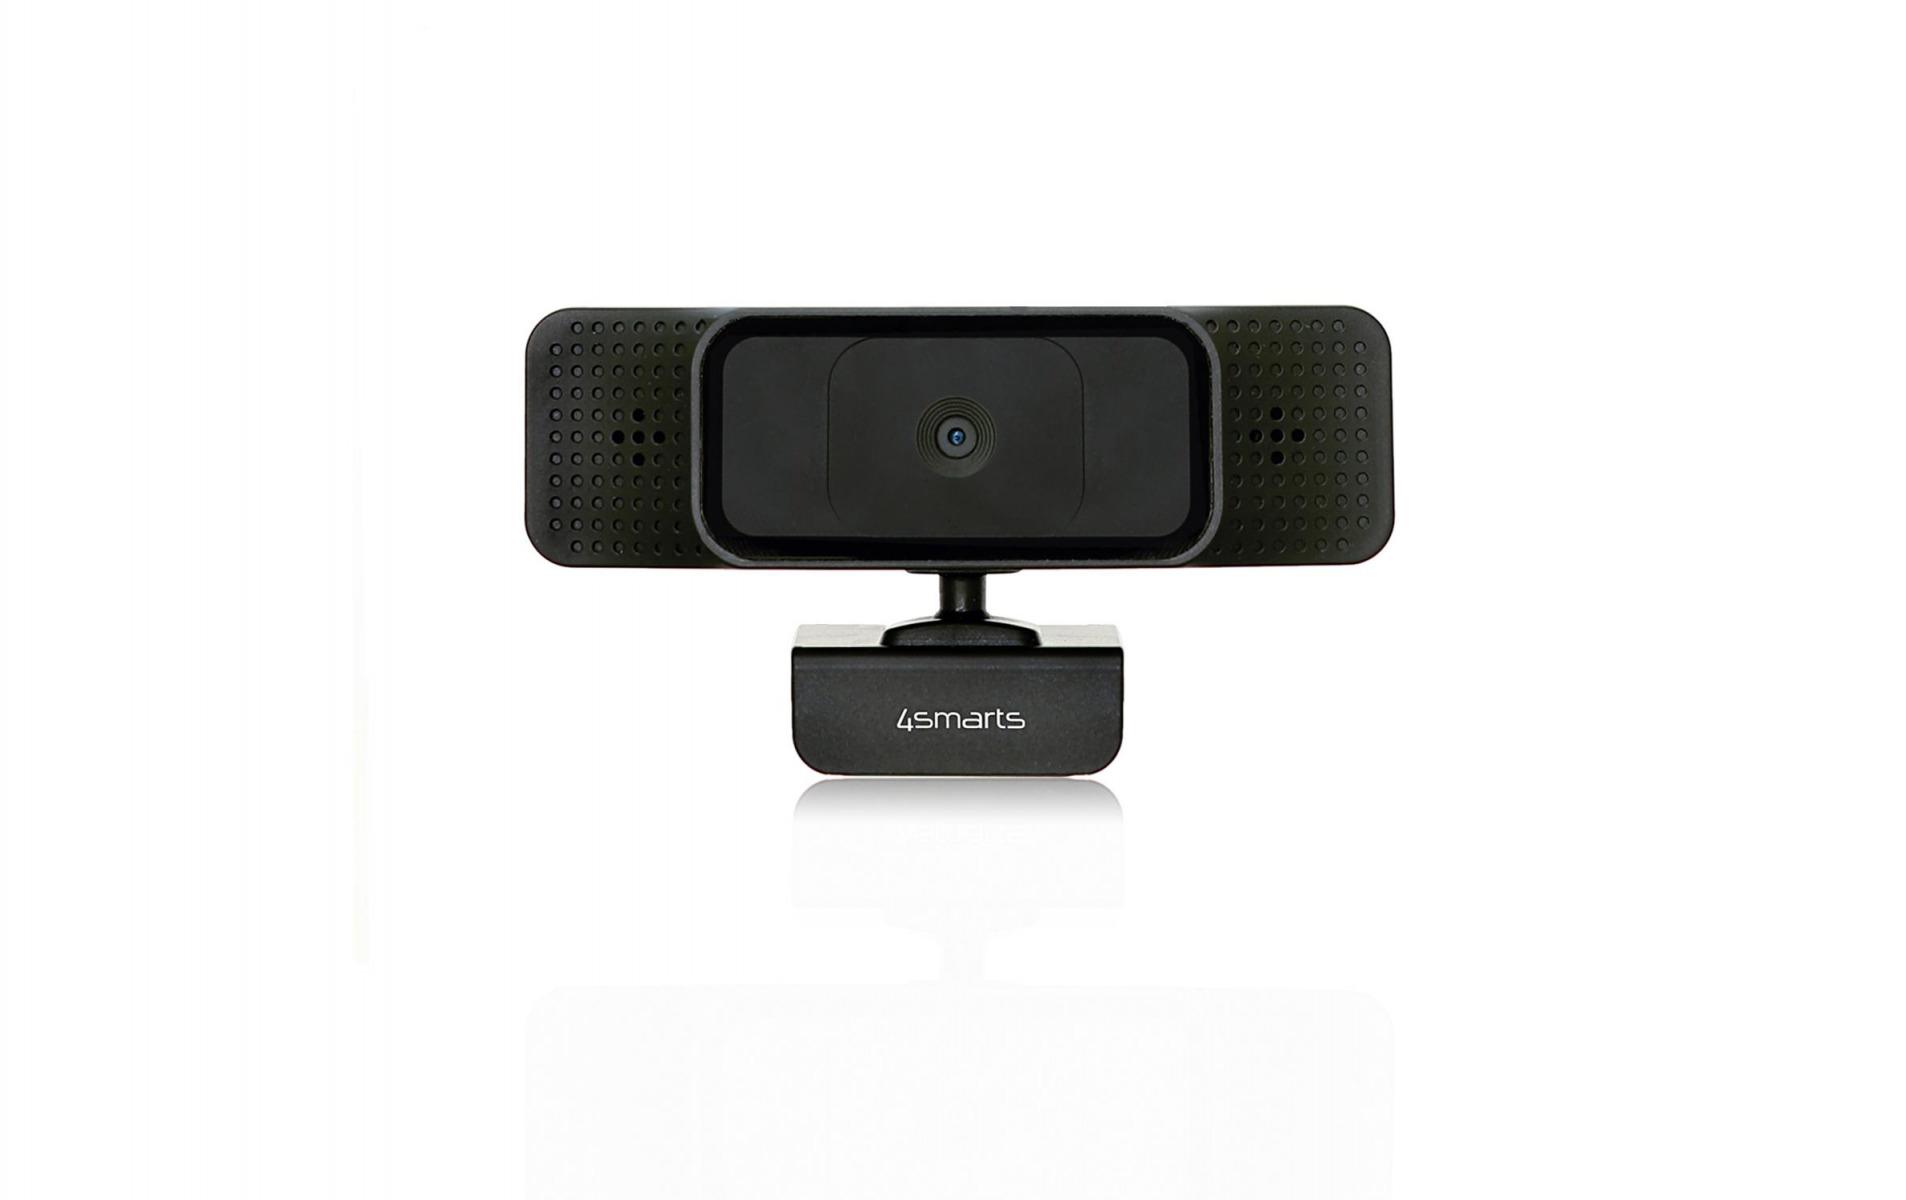 Image of 4smarts Webcam Universal 1080p